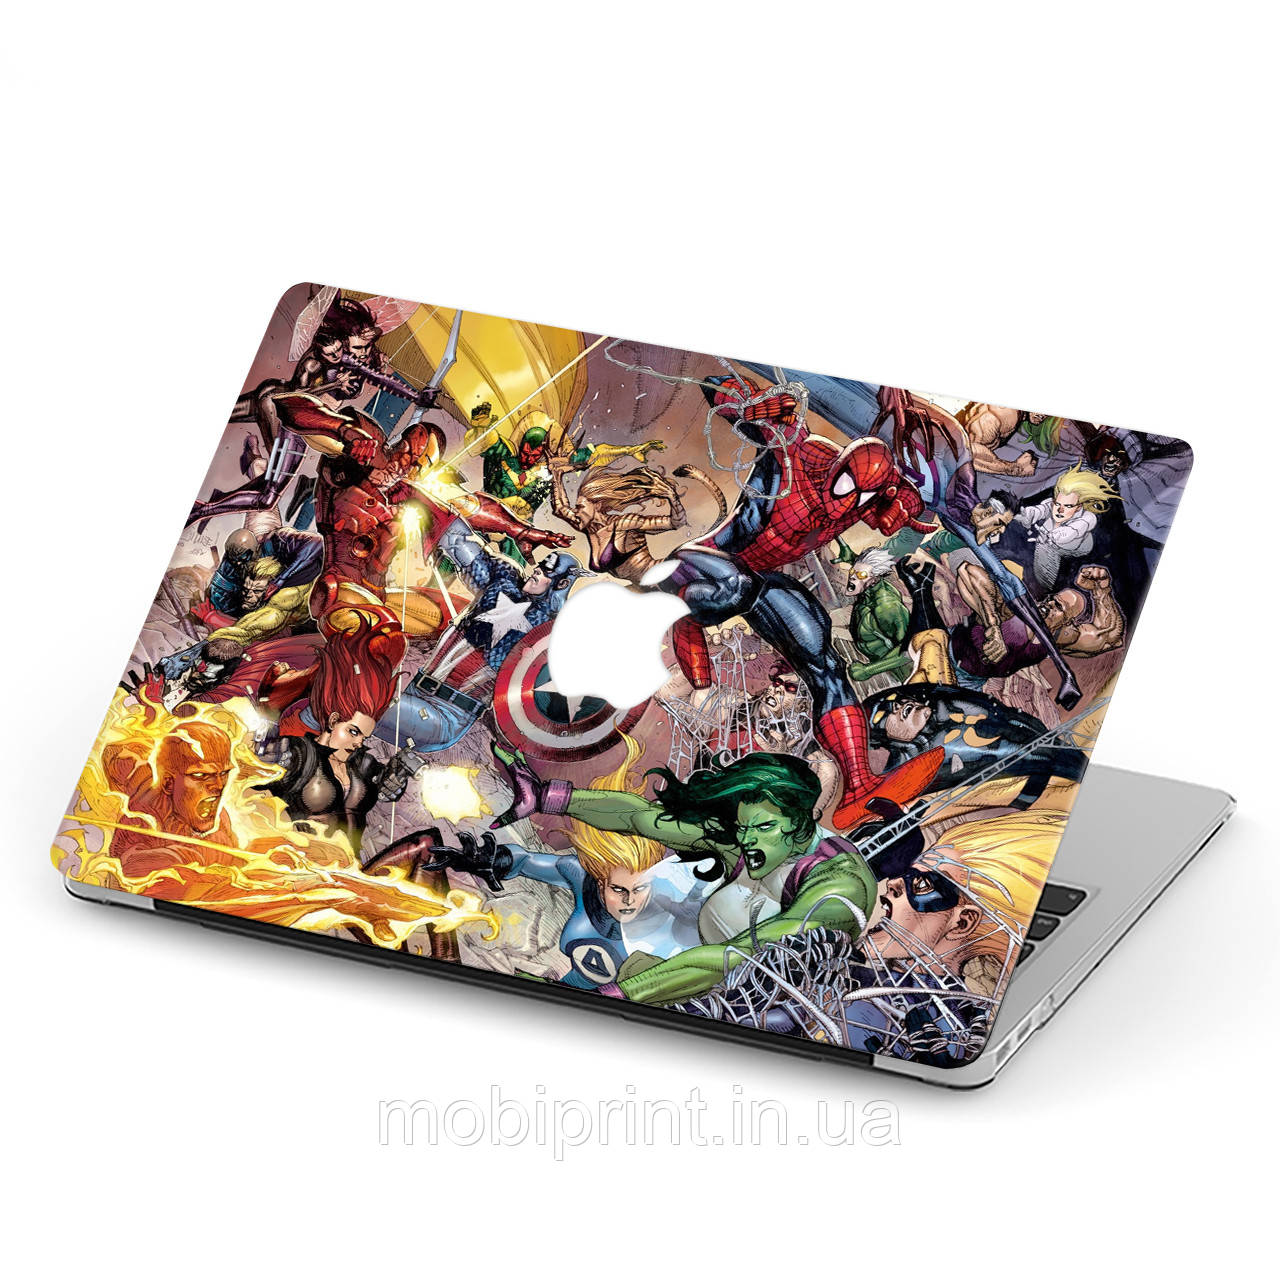 Чехол пластиковый для Apple MacBook Pro / Air Мстители (The Avengers) макбук про case hard cover